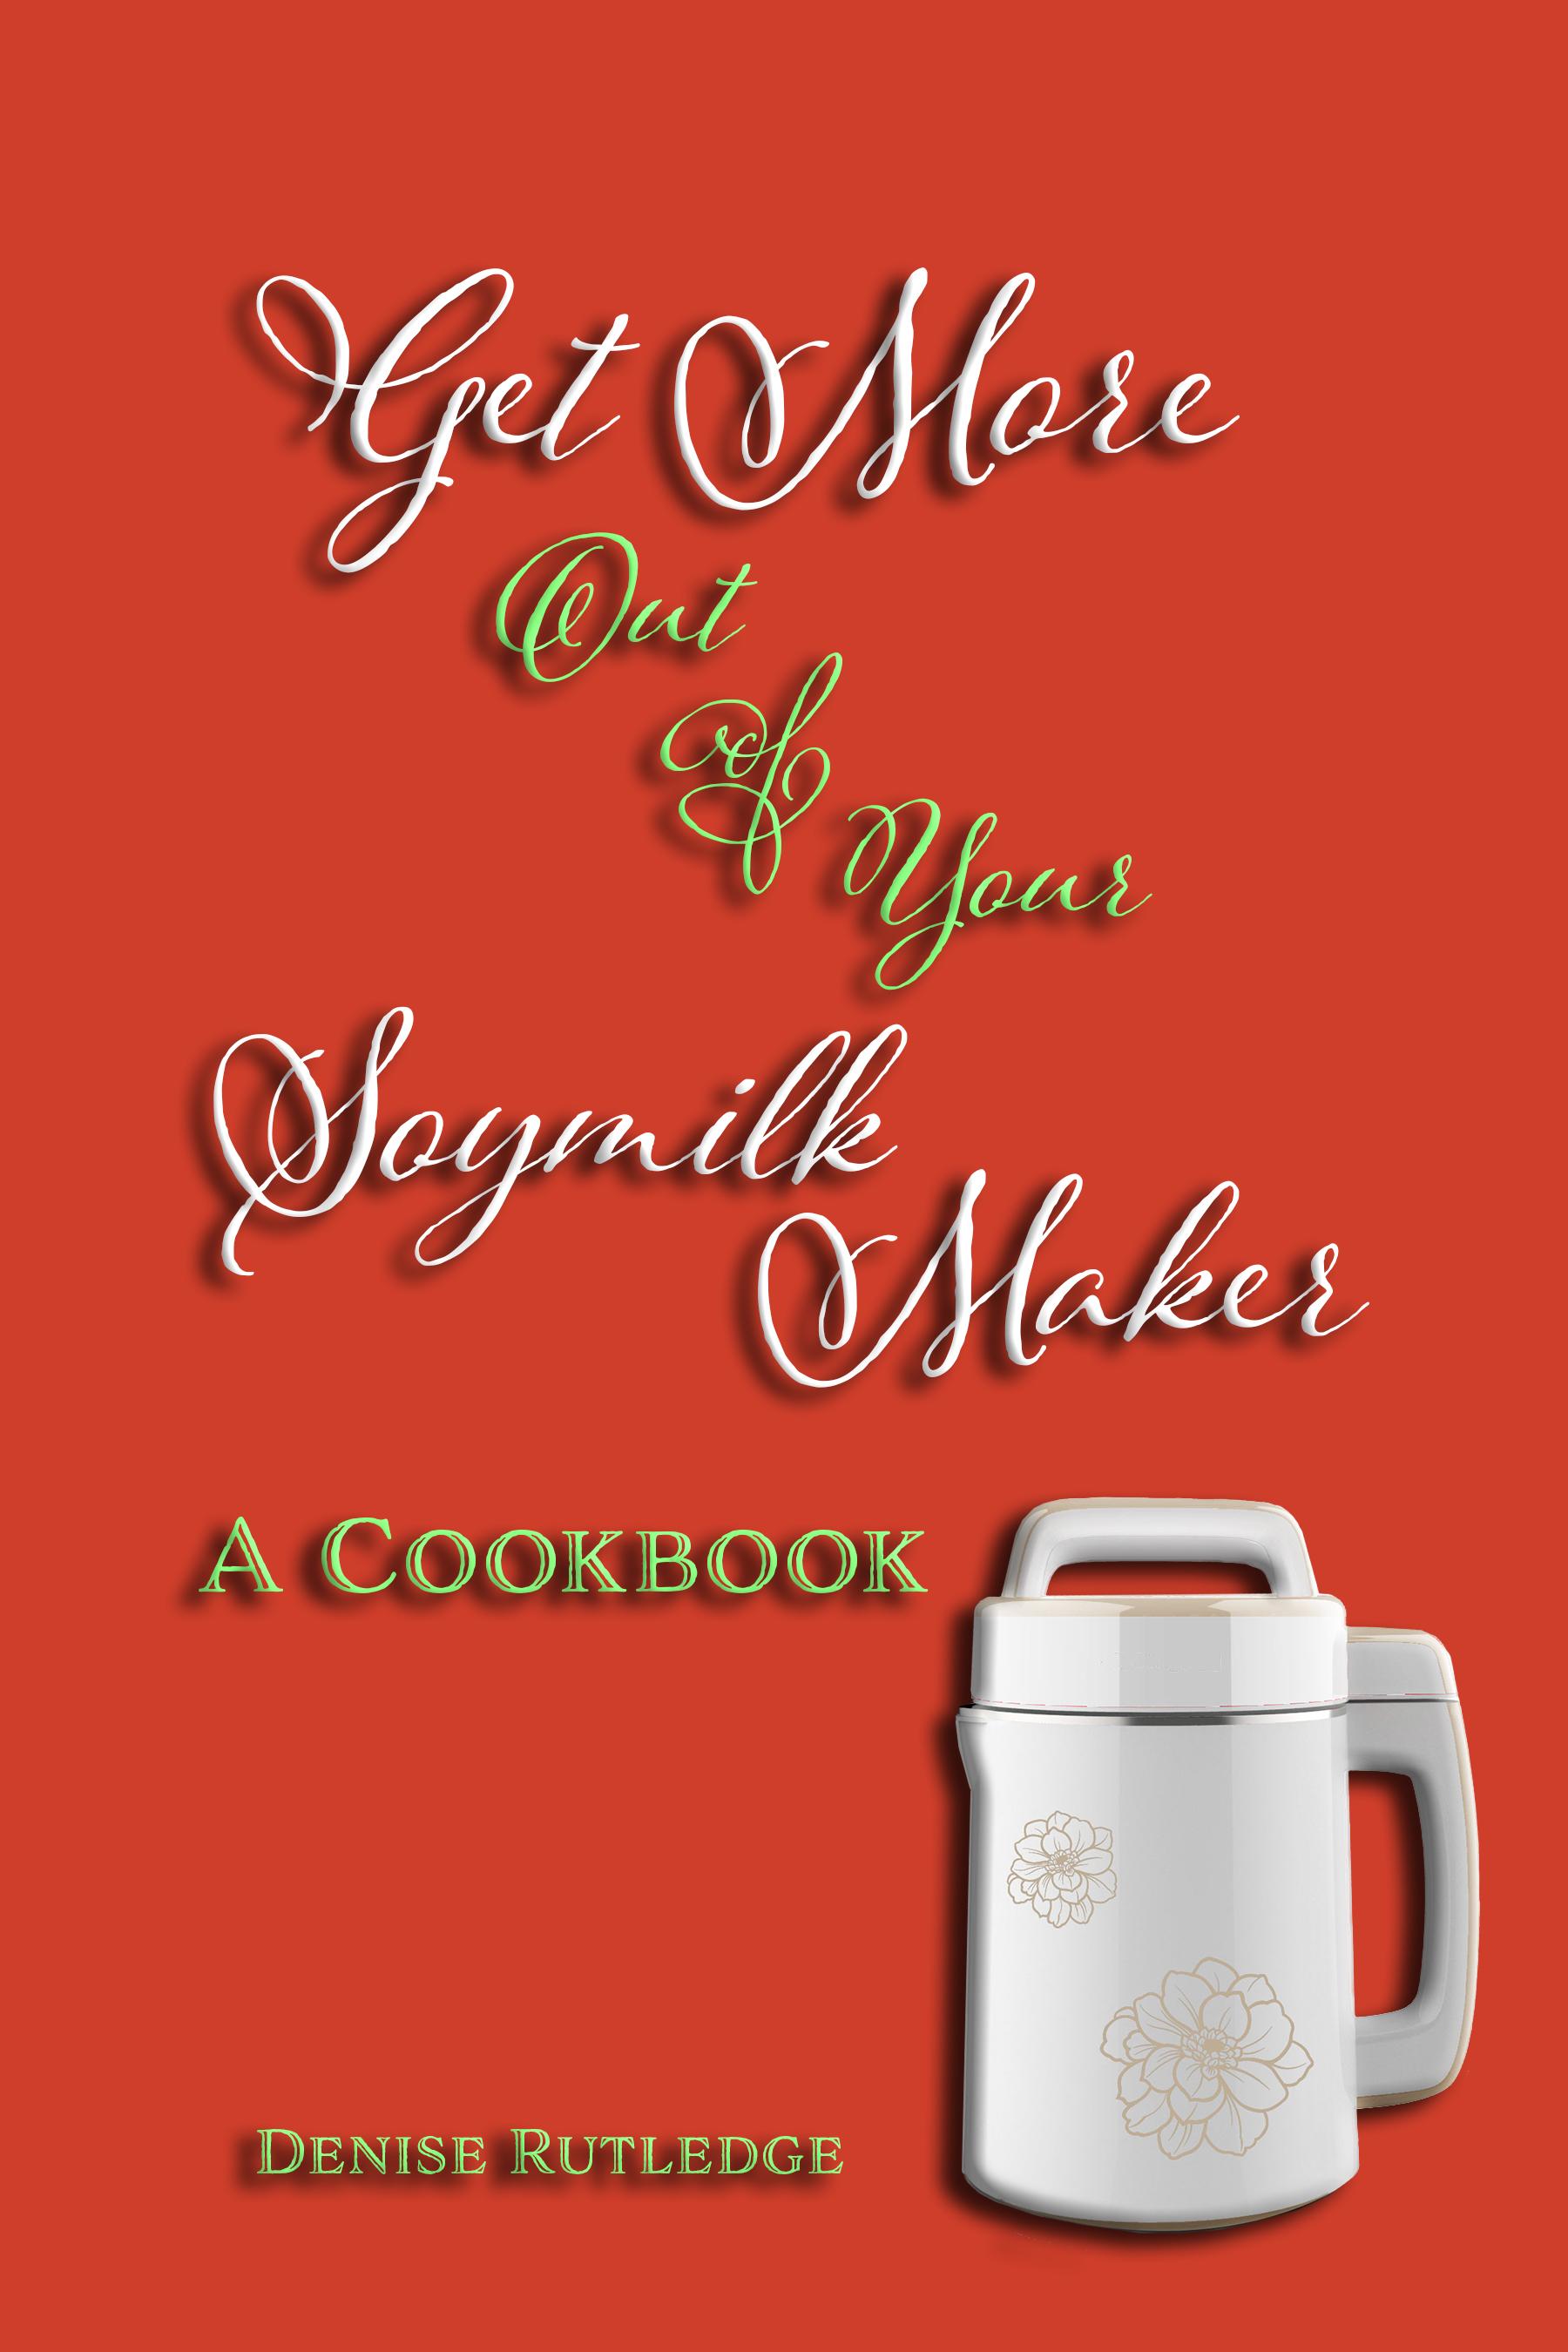 Cookbook Cover Template Maker ~ Book cover maker. book review the circle maker. book cover maker